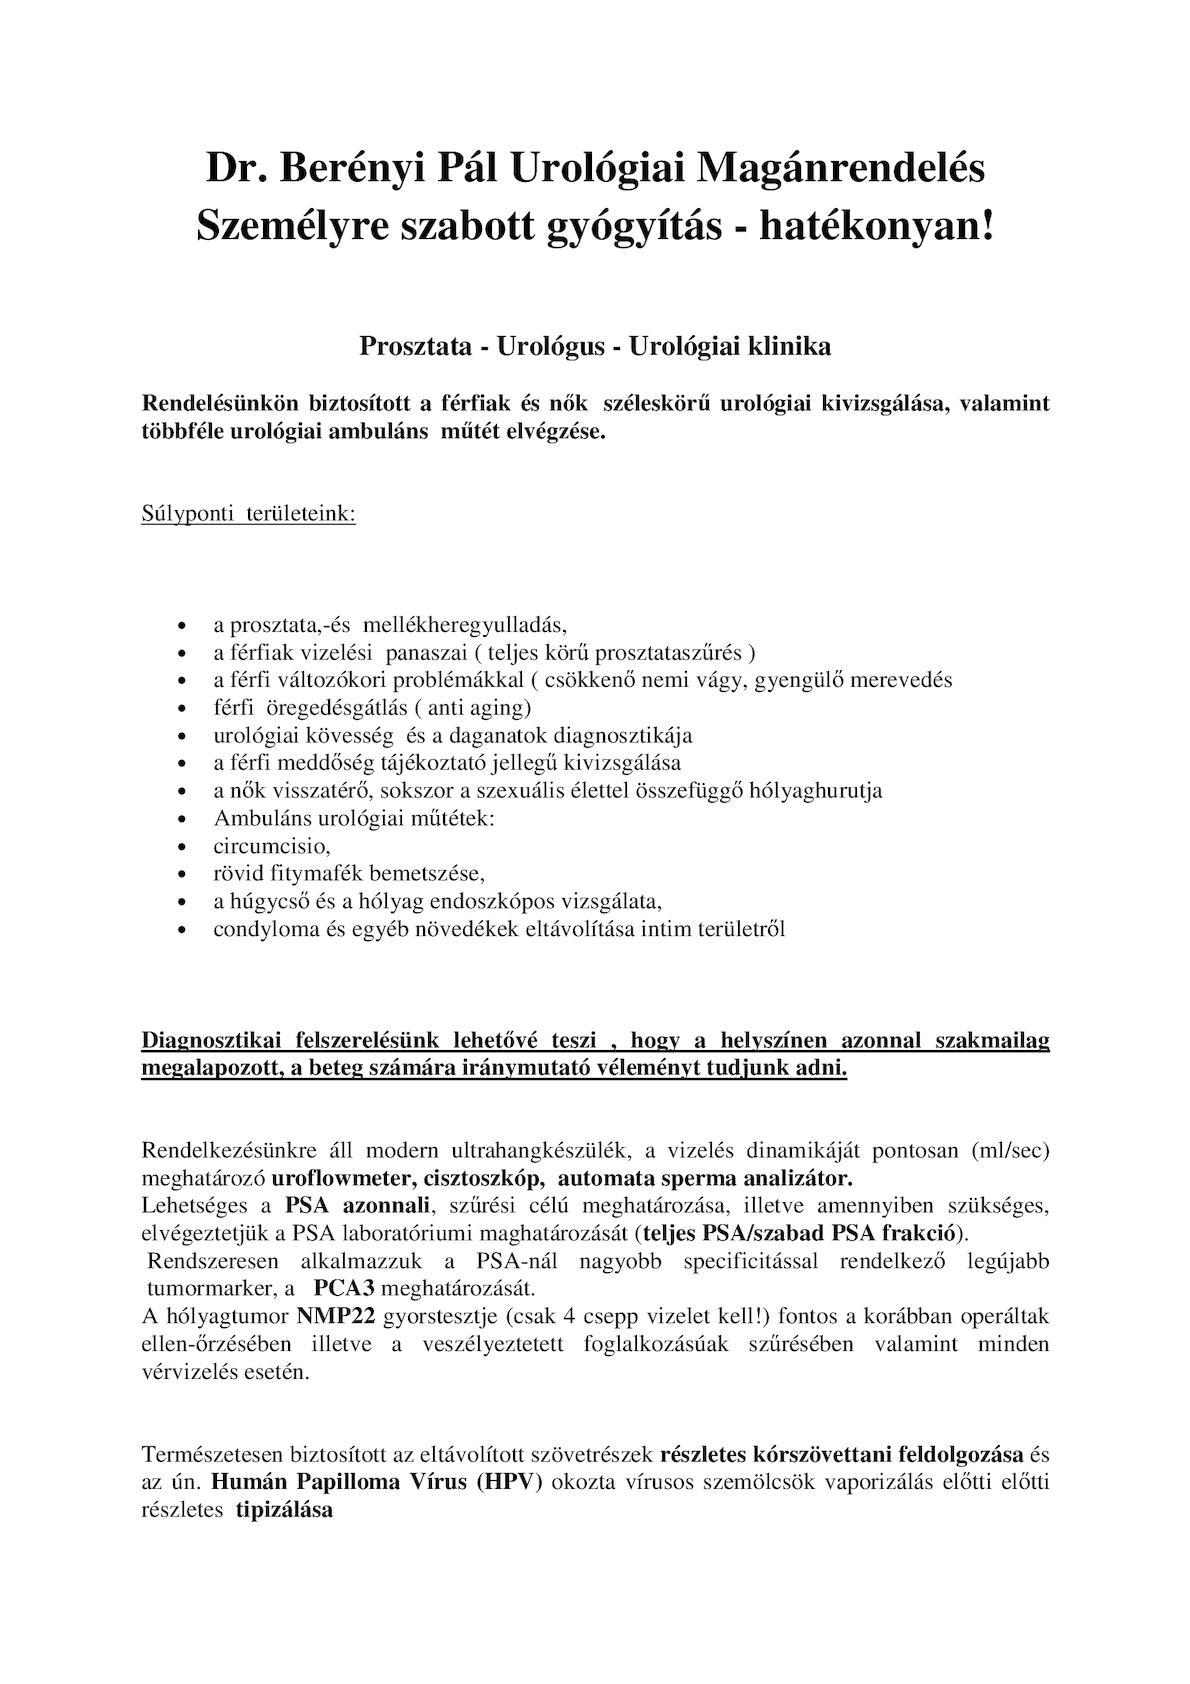 Dr. Diag - Papilloma urethrae